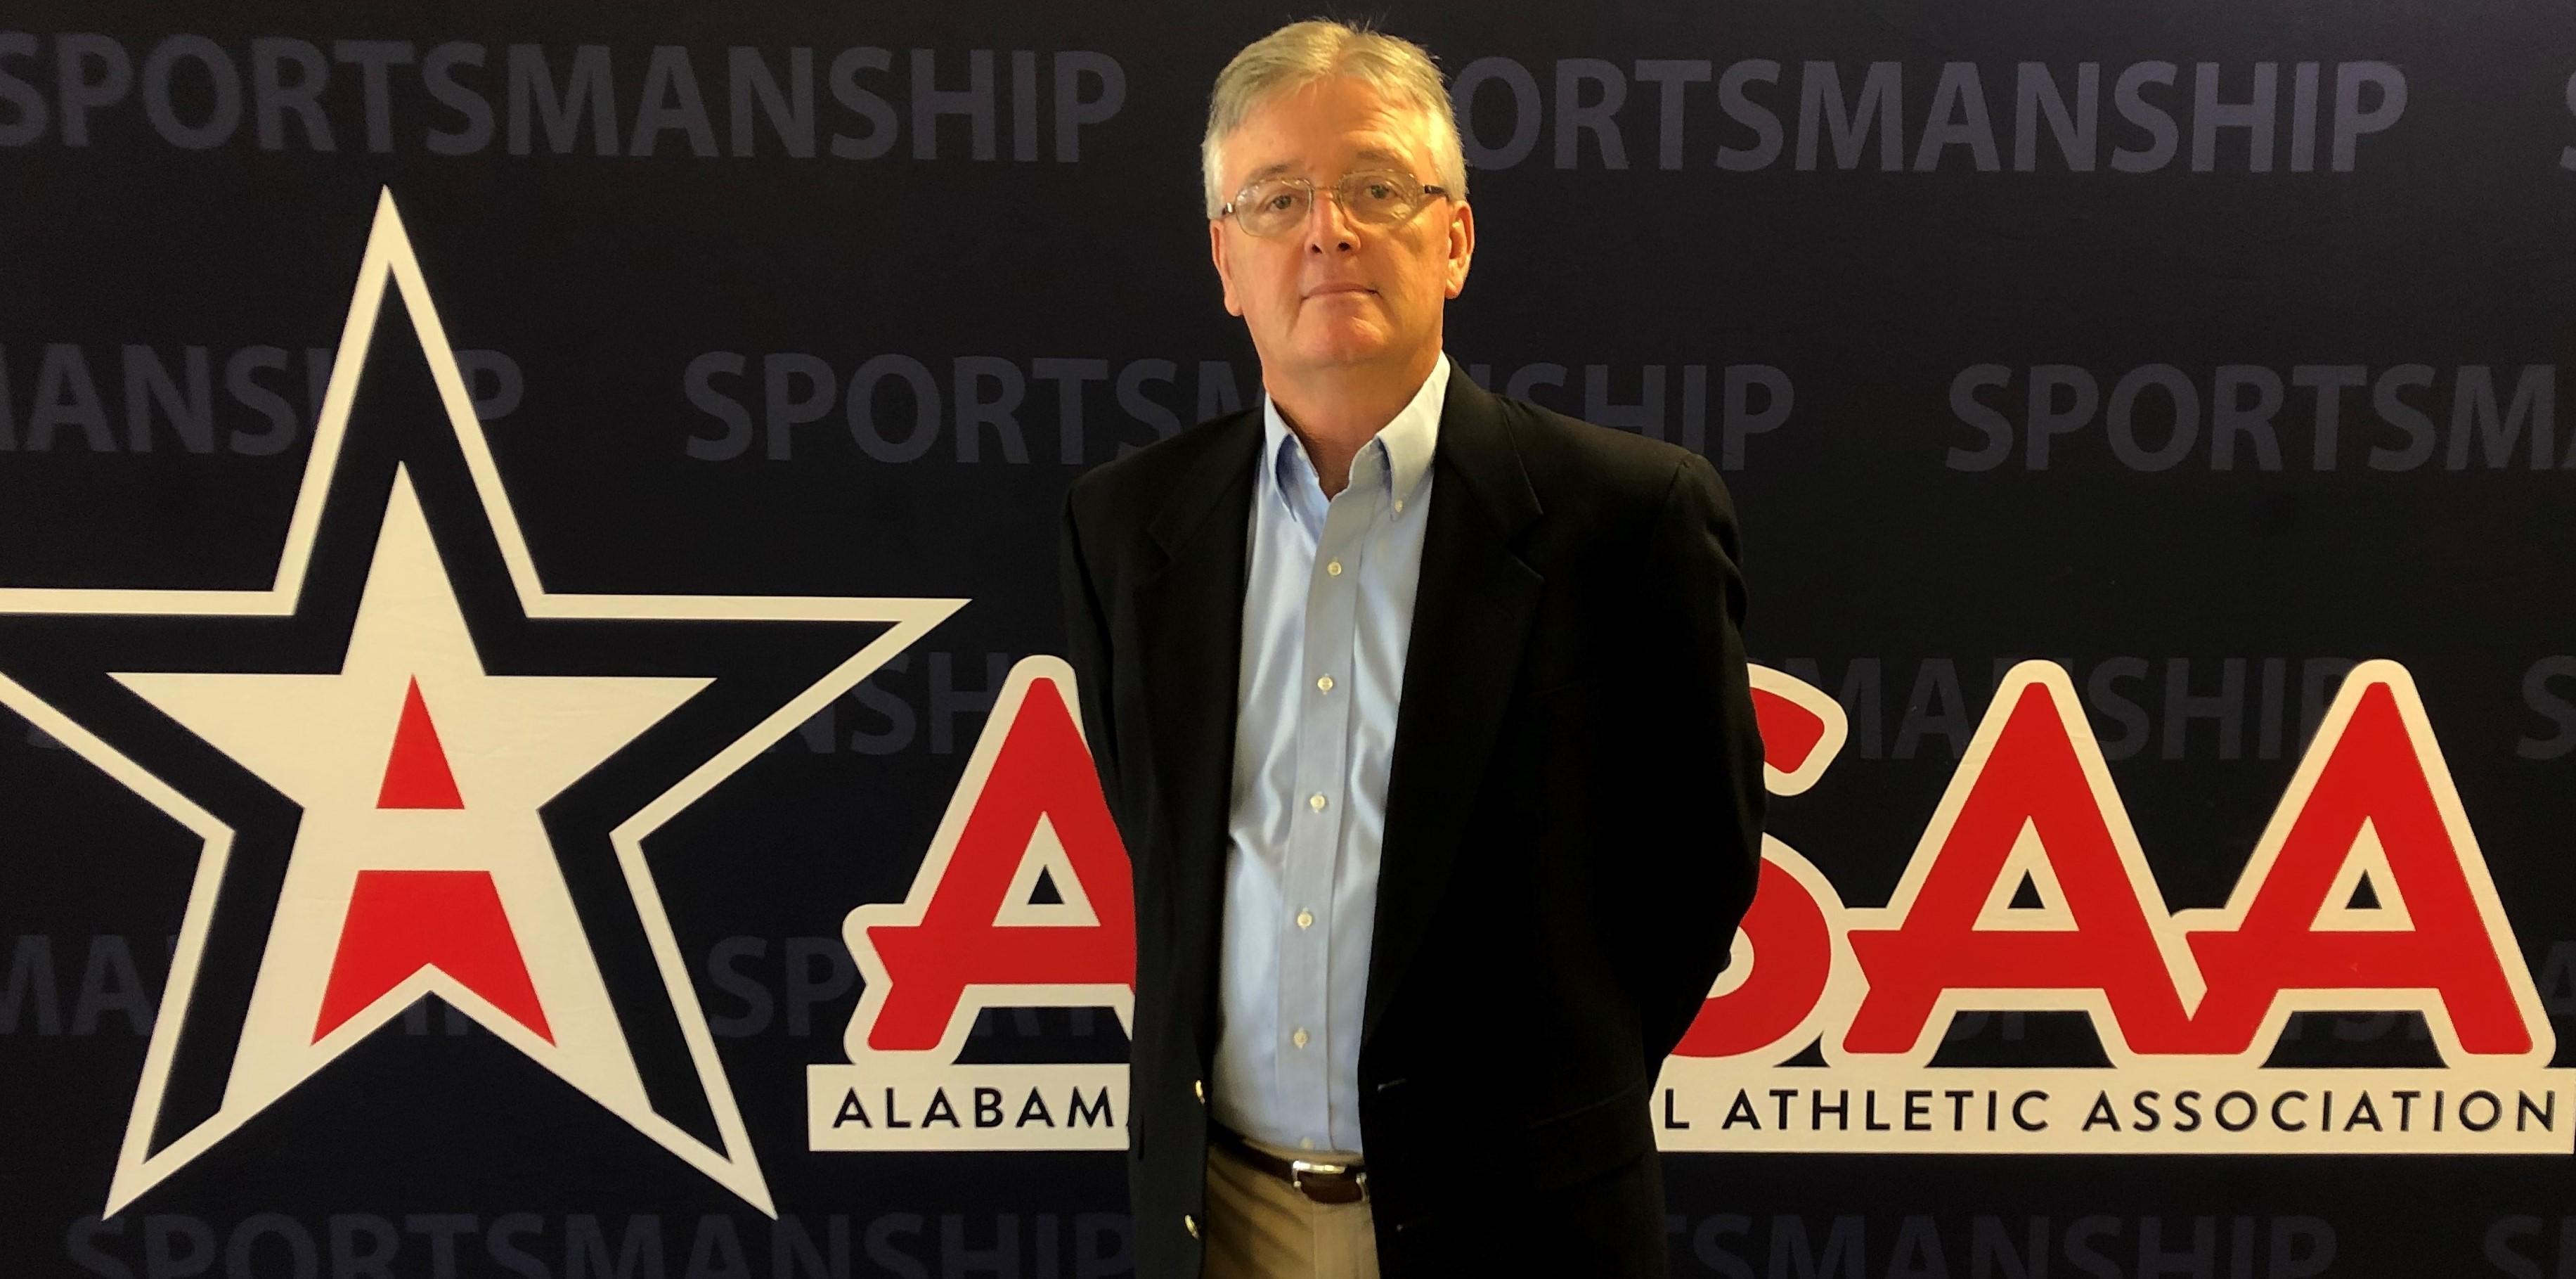 Coaching Baseball Was Inevitable for Mark Mincher, Son of Former Major Leaguer